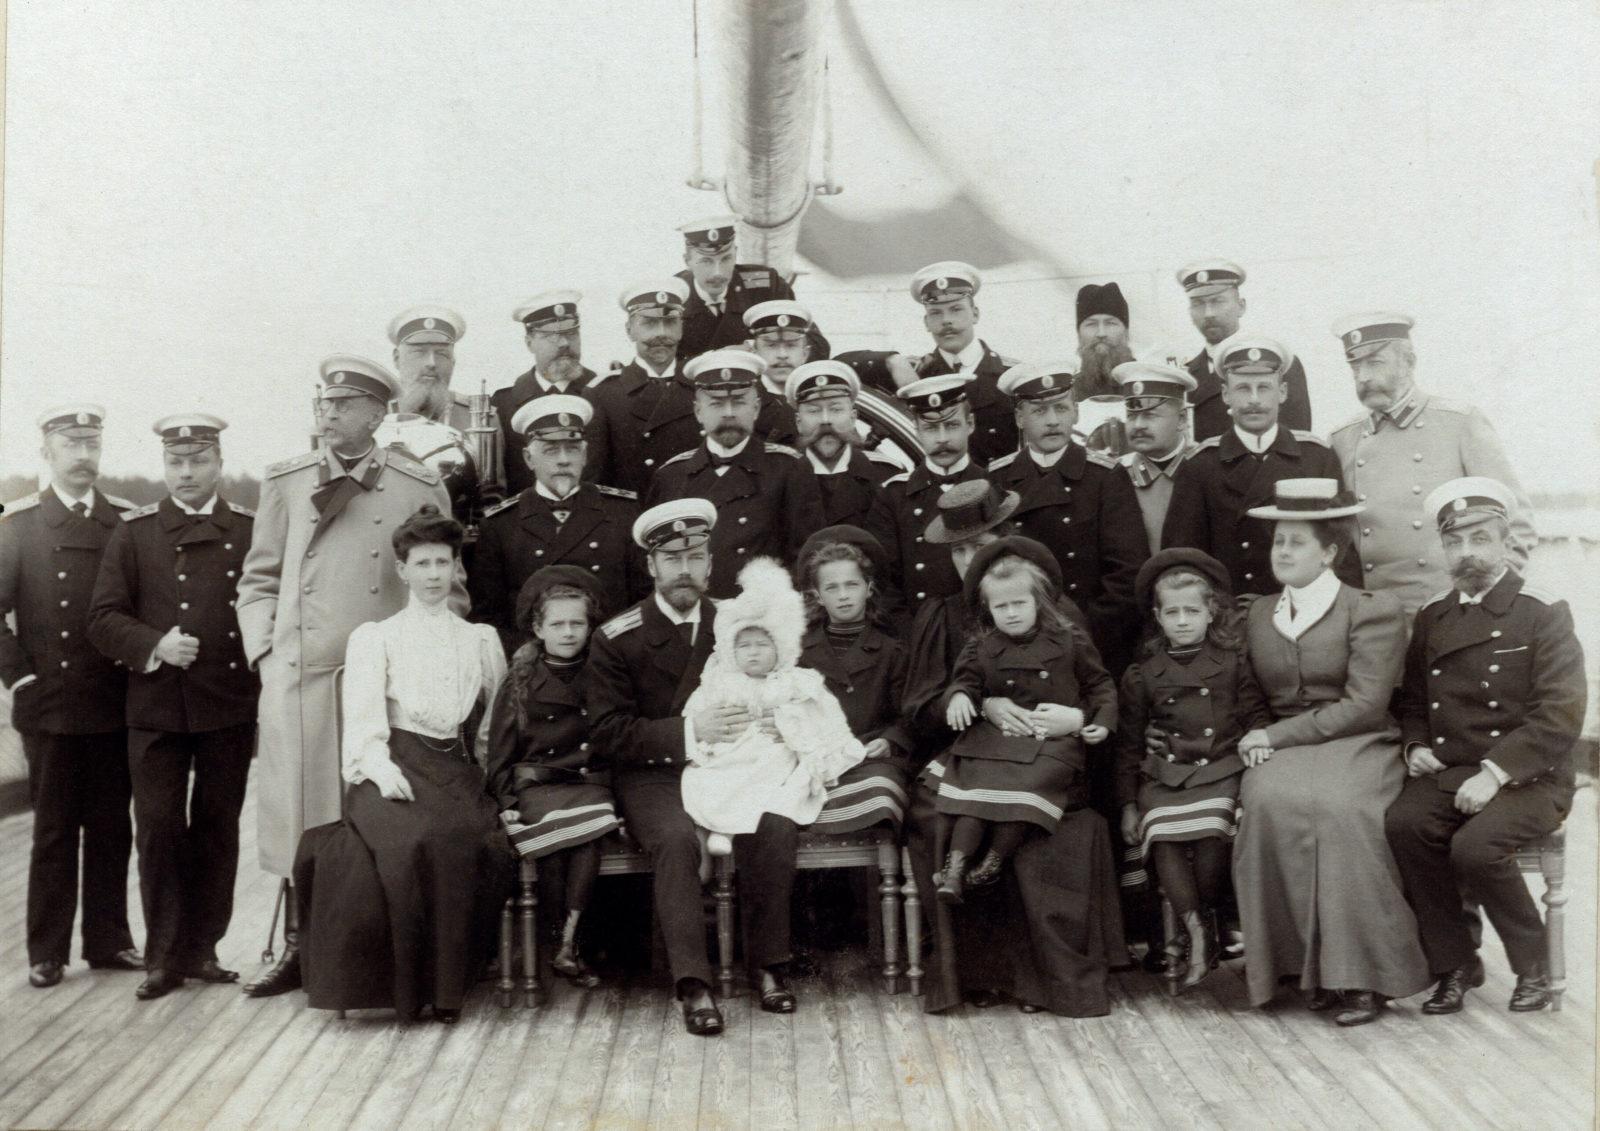 Emperor Nicholas II, Empress Alexandra Feodorovna, Grand duchesses Tatiana, Olga, Maria, Anastasia, tsesarevitch Alexei with navy officers on Imperial yacht Standard